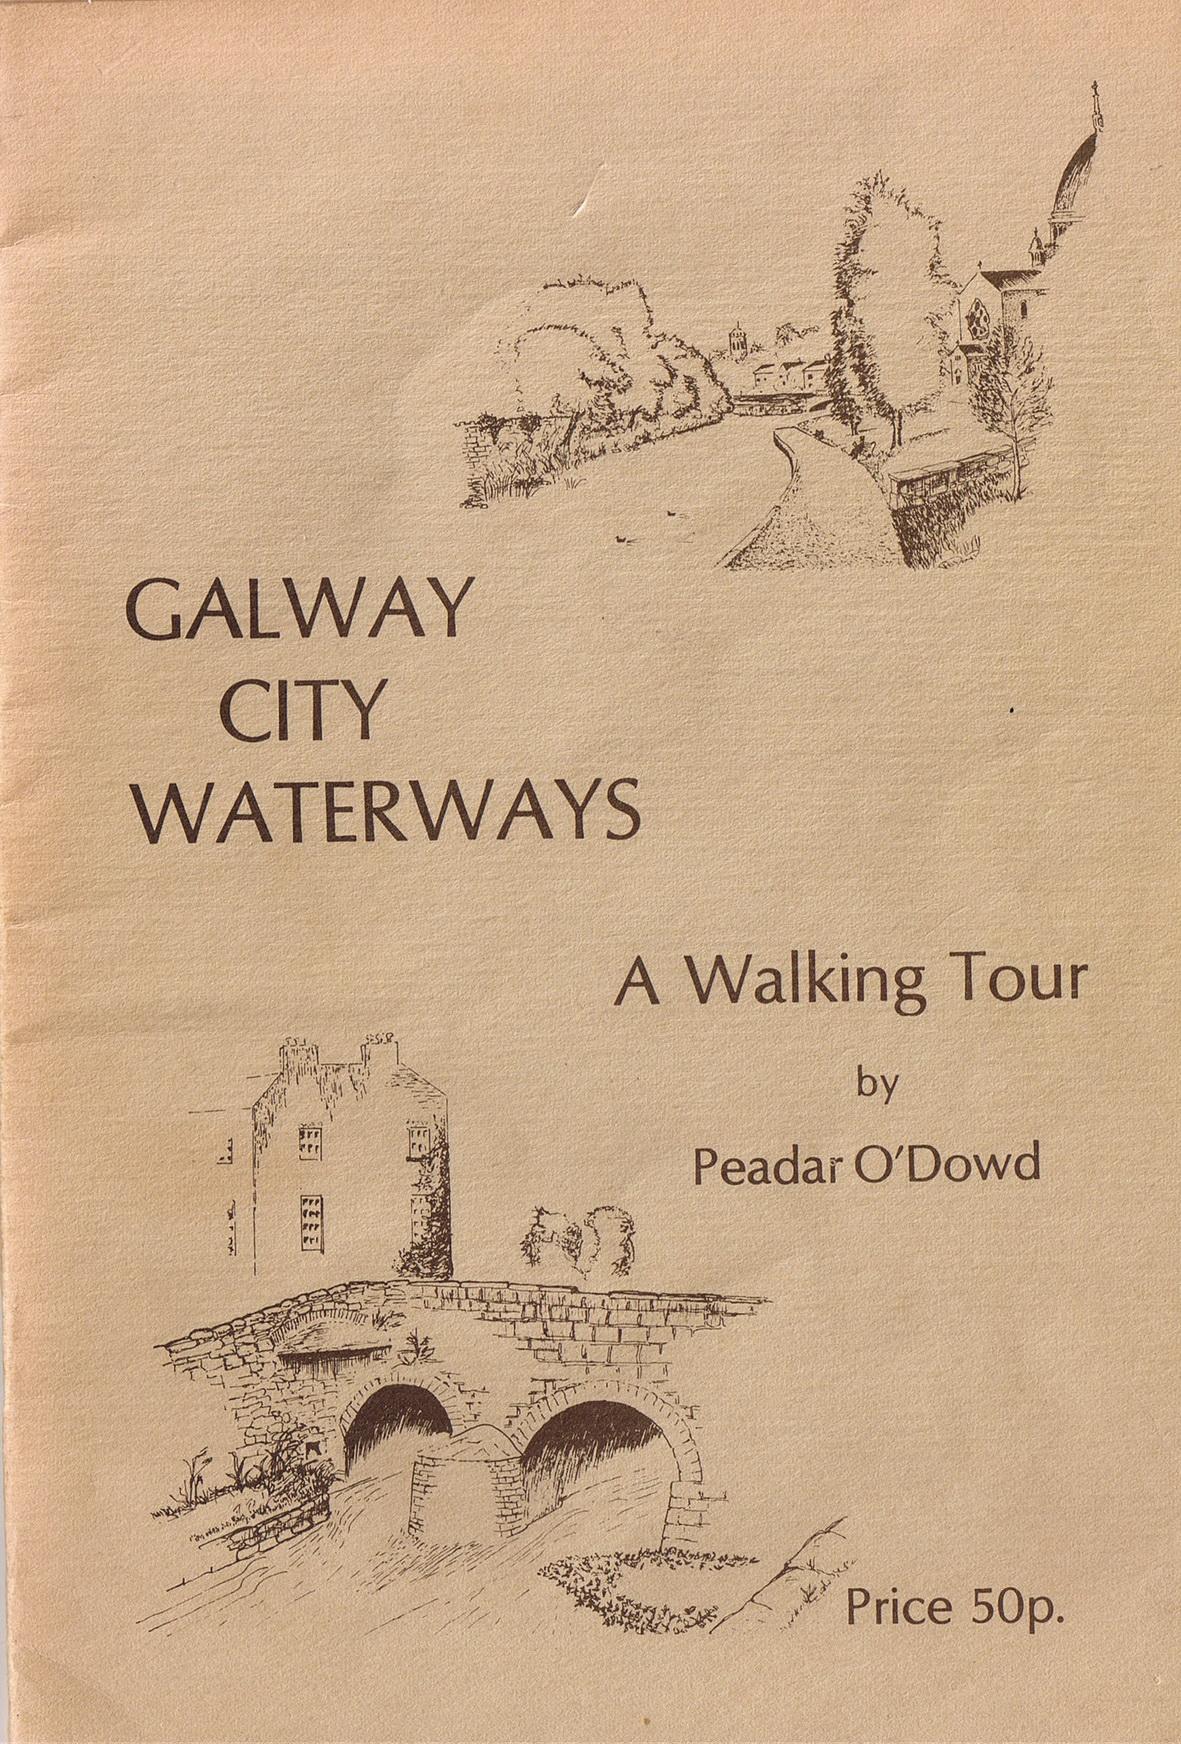 Galway City Waterways